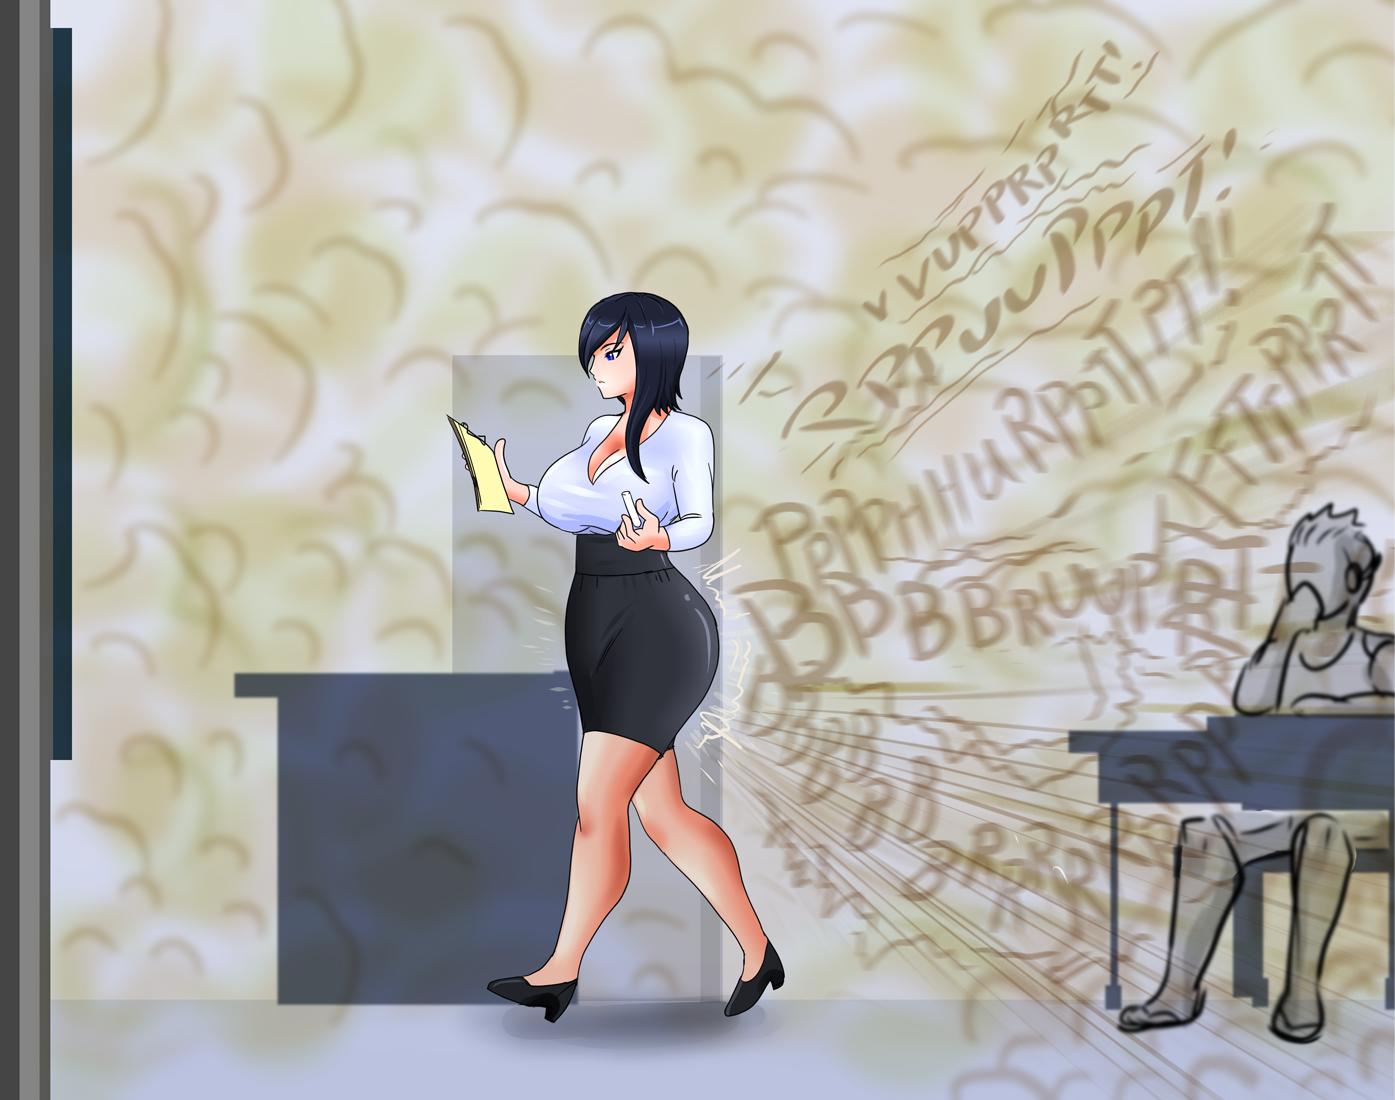 Girl Fart In Tub Deviantart: (Fanart) Professor Diza By Leshawk On DeviantArt